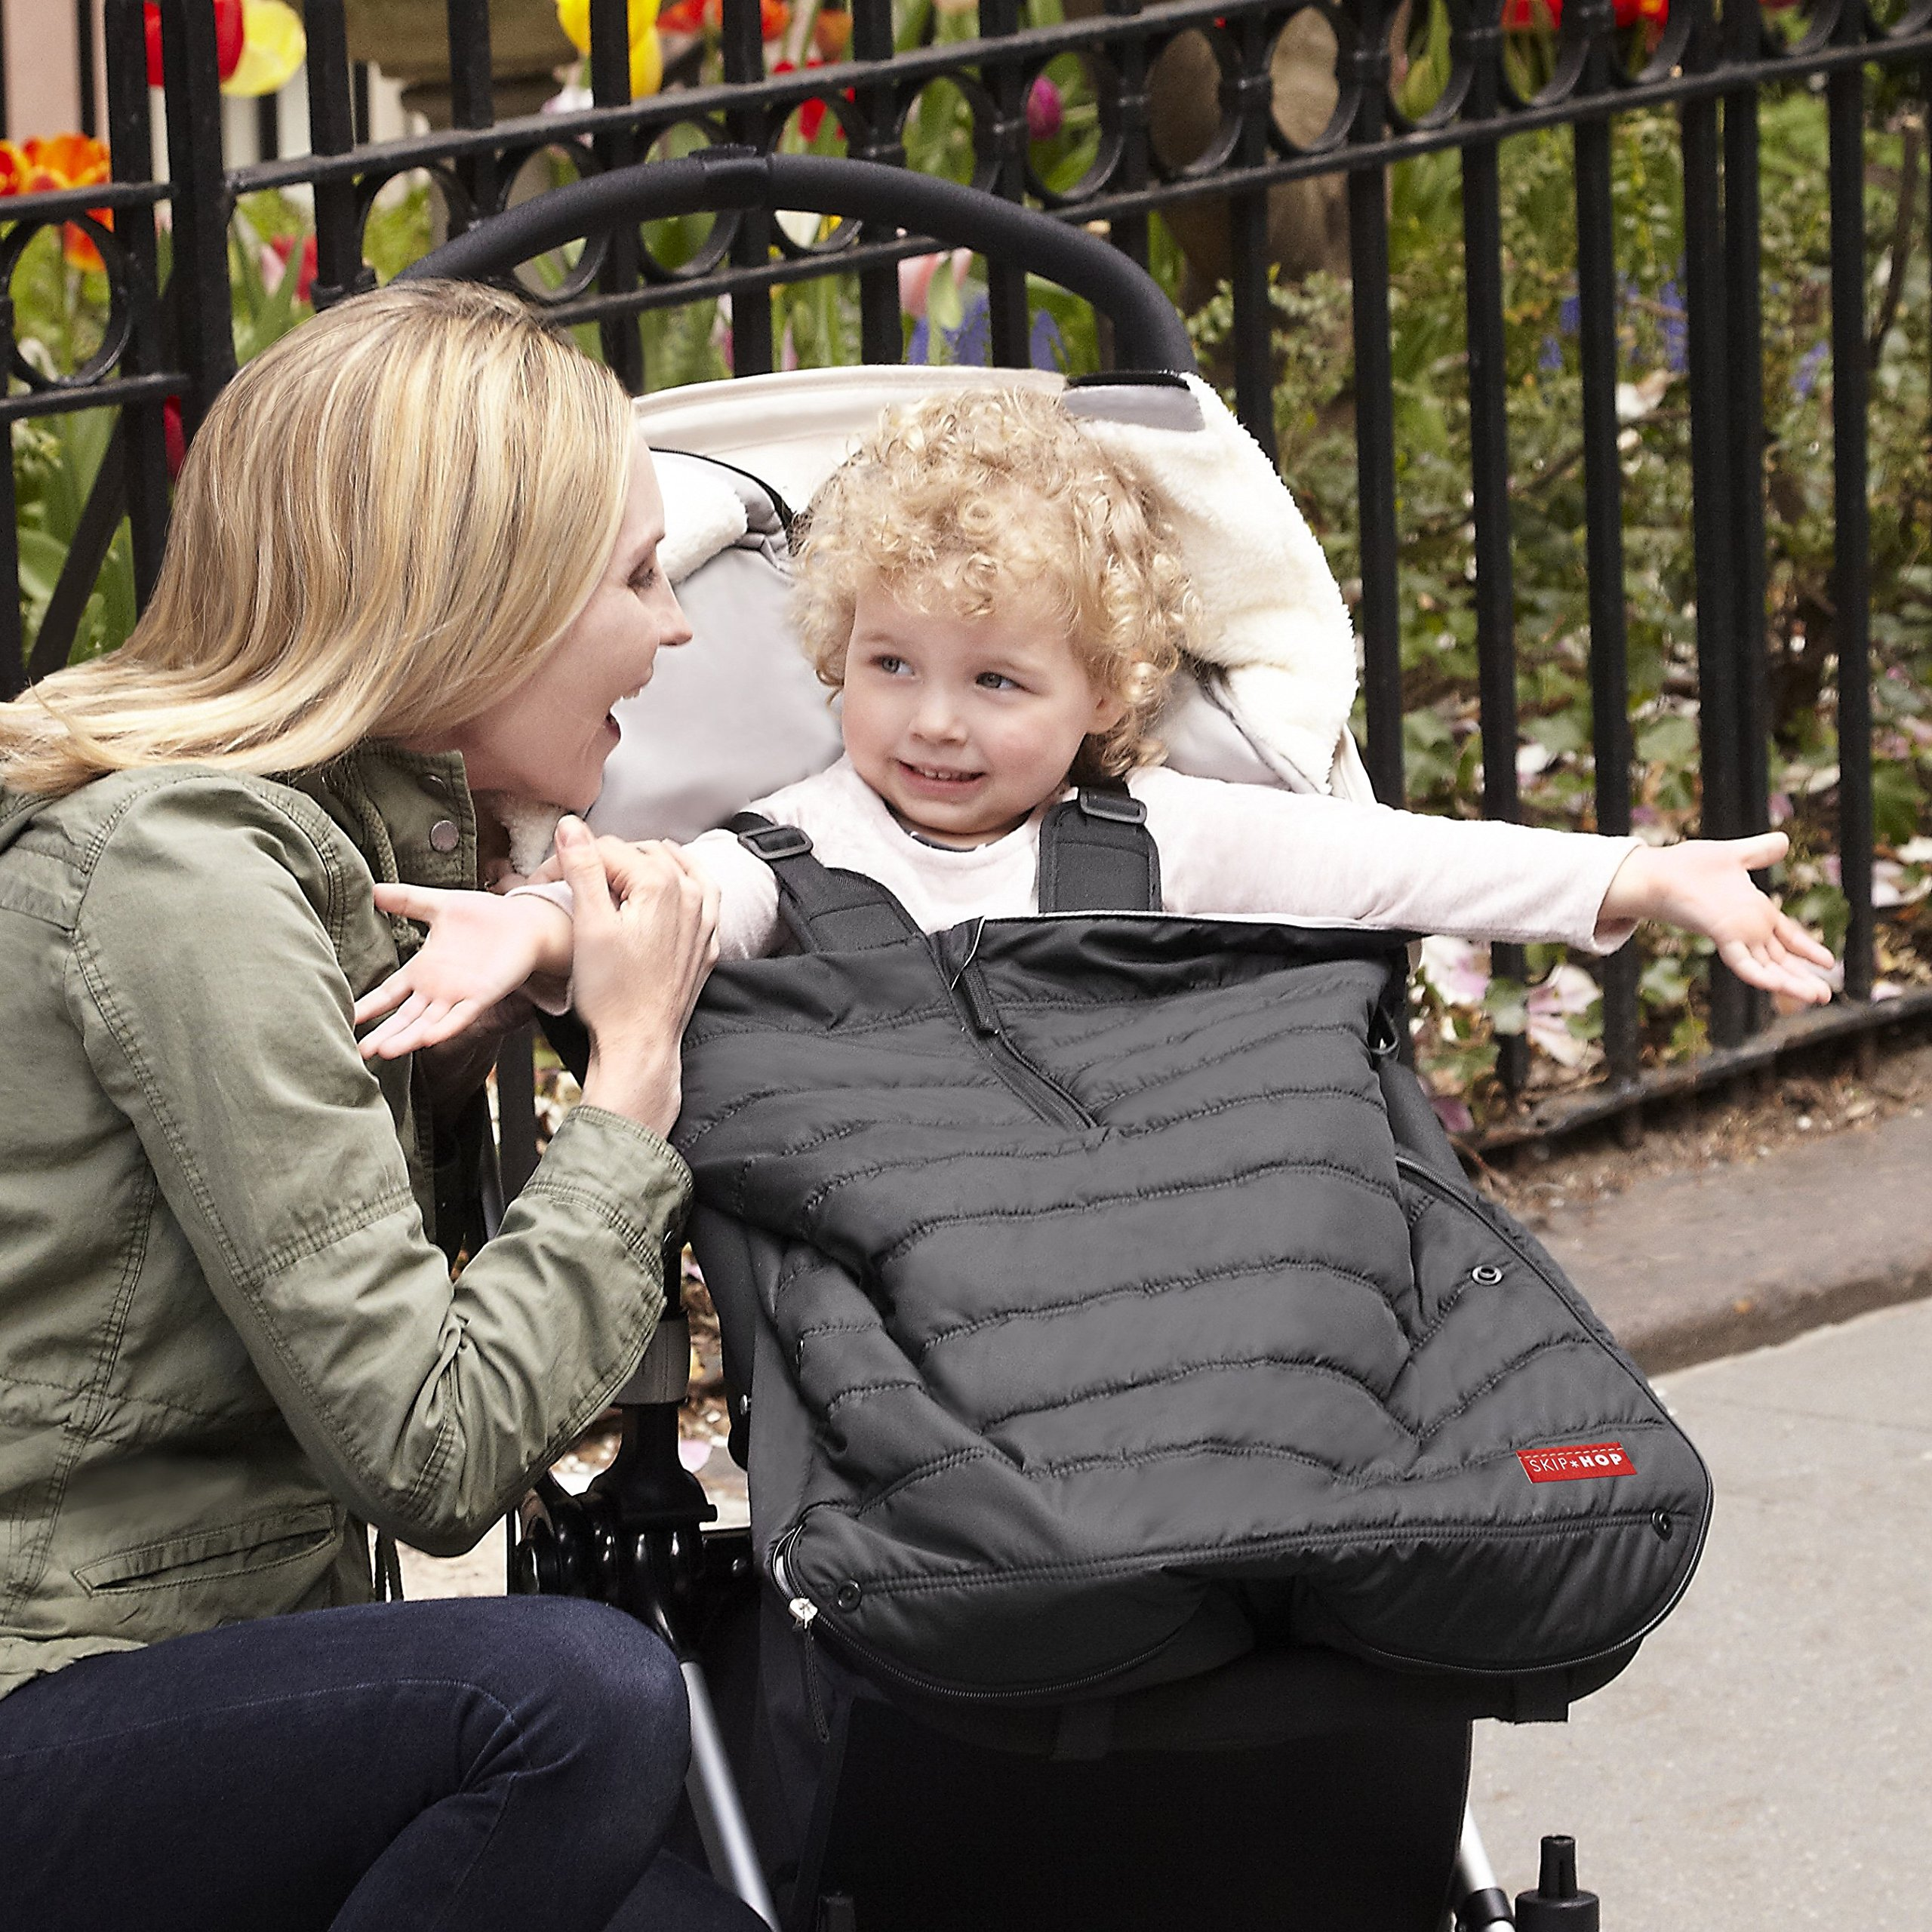 Skip Hop Stroll-and-Go Three-Season Stroller Footmuff, Toddler, Black by Skip Hop (Image #4)